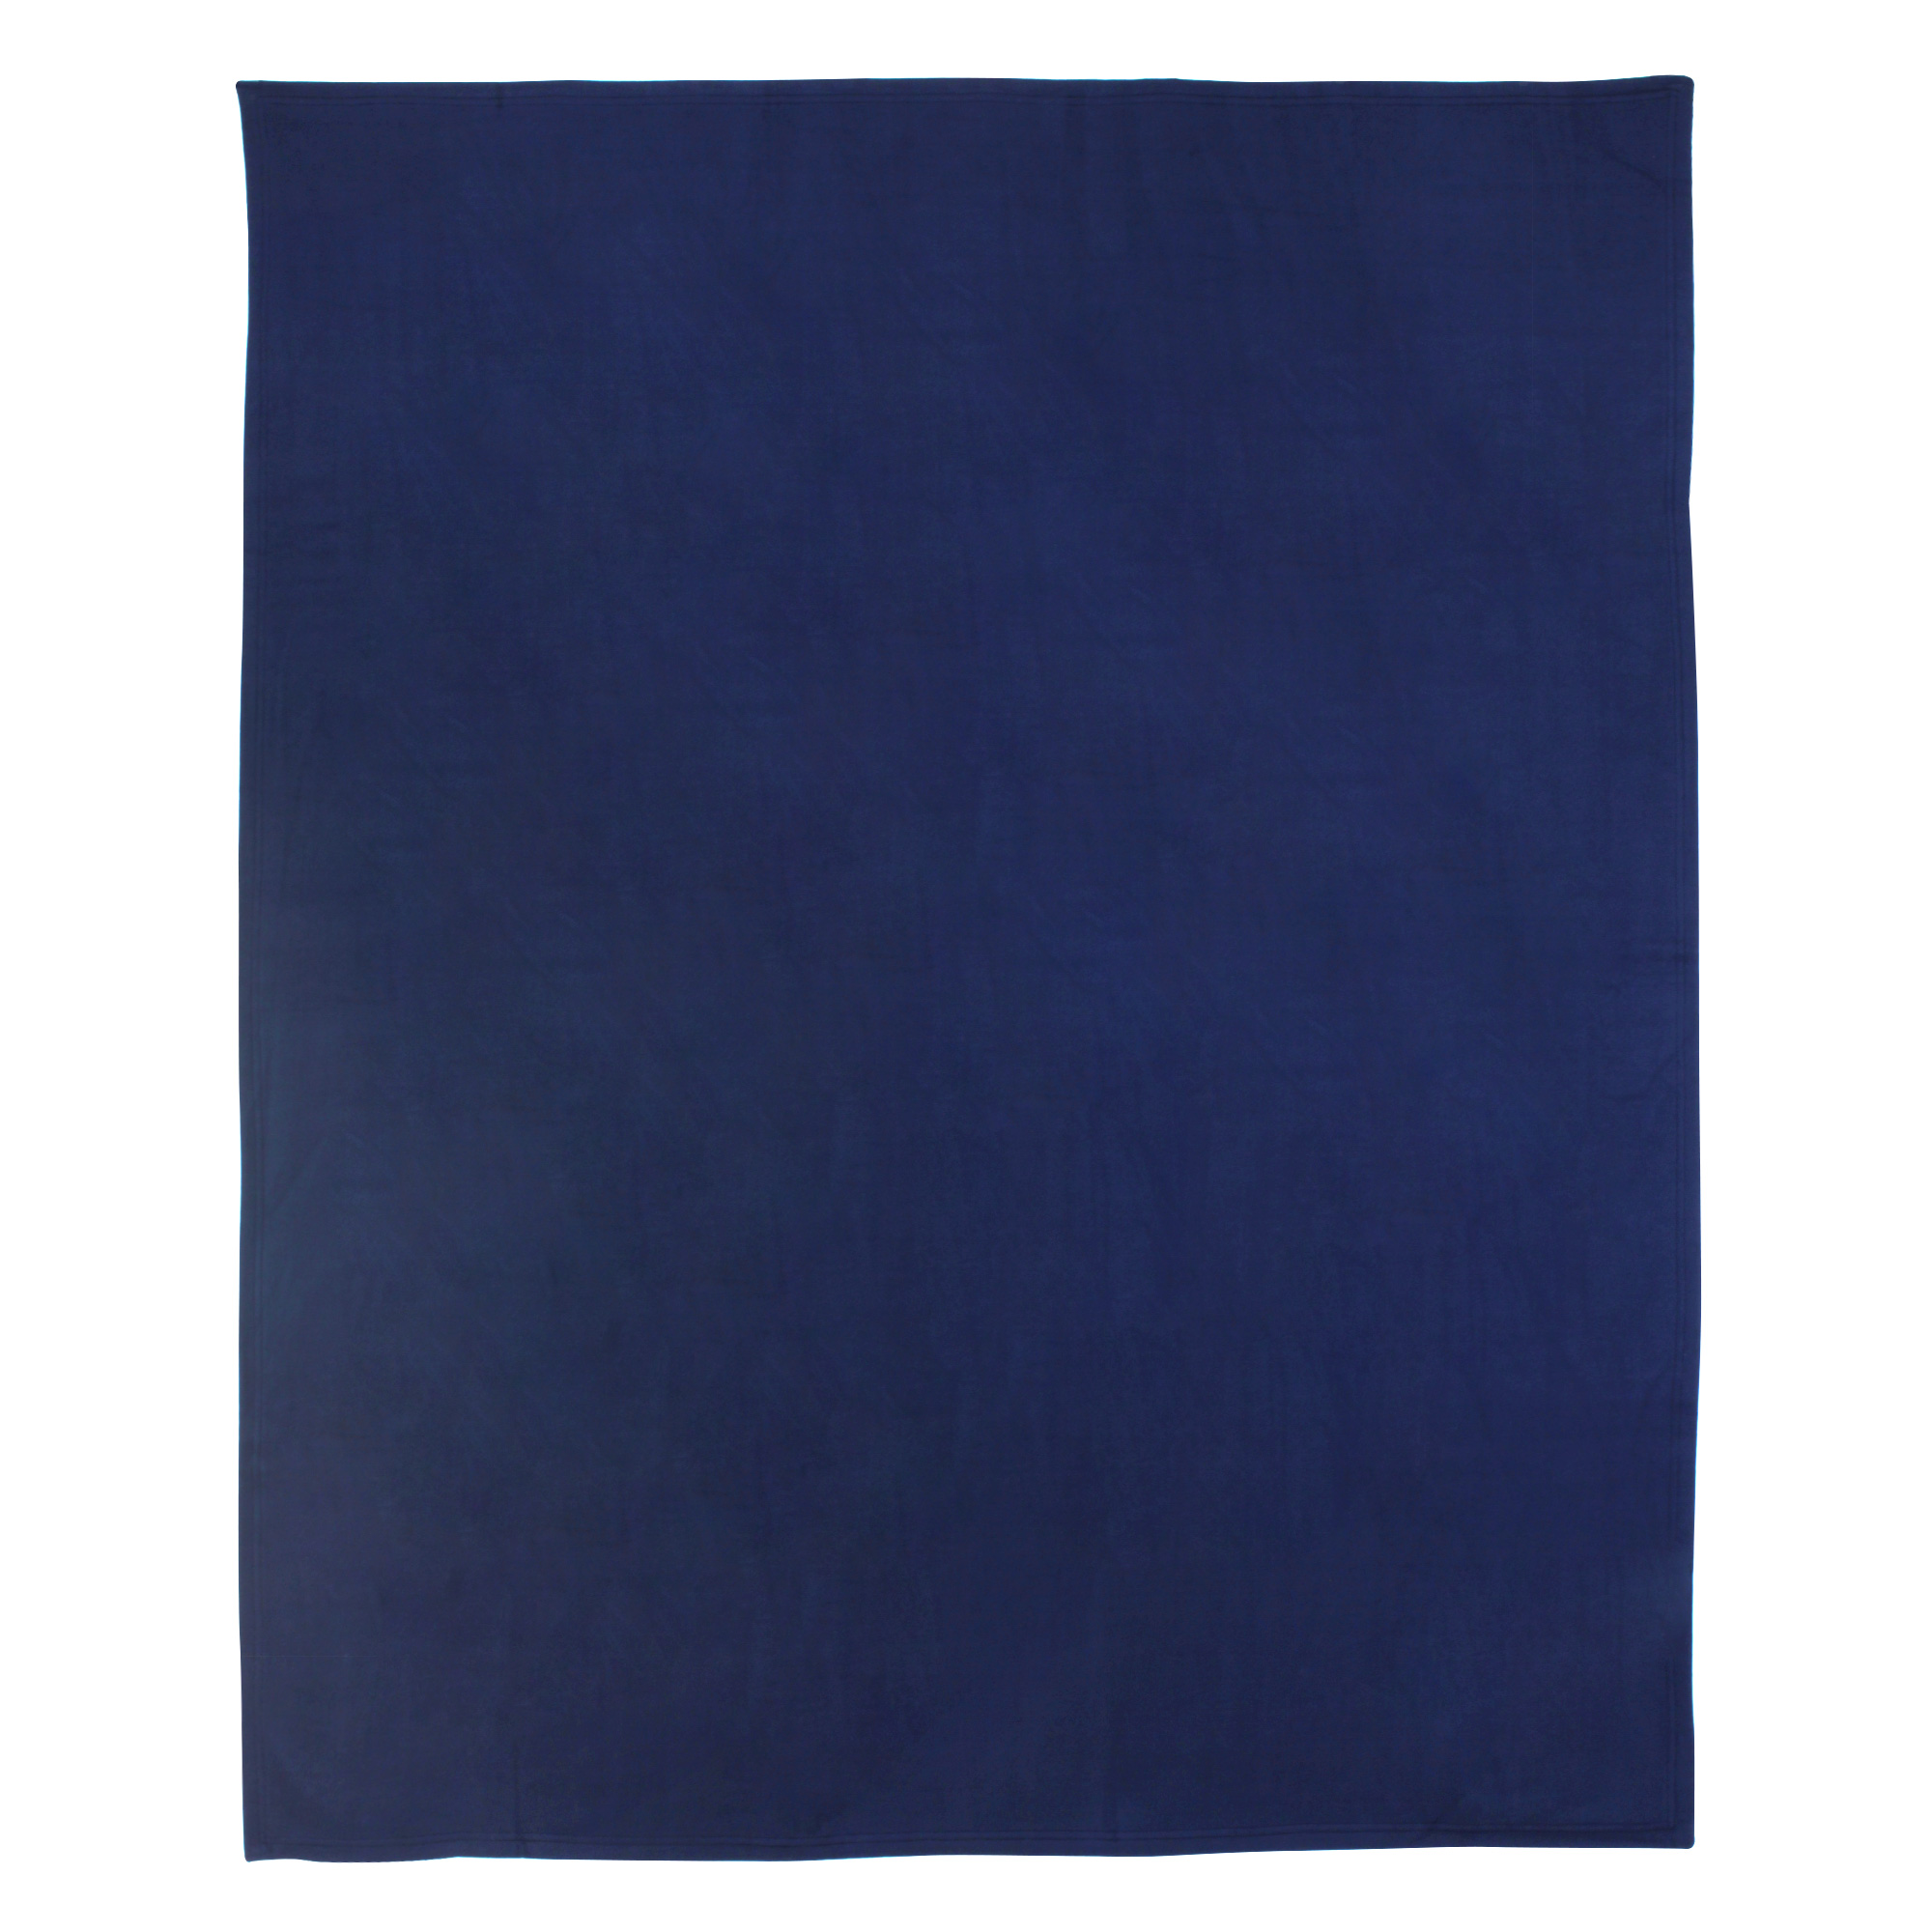 Couverture-polaire-180x220-100-Polyester-350g-m2-TEDDY-Bleu-Marine